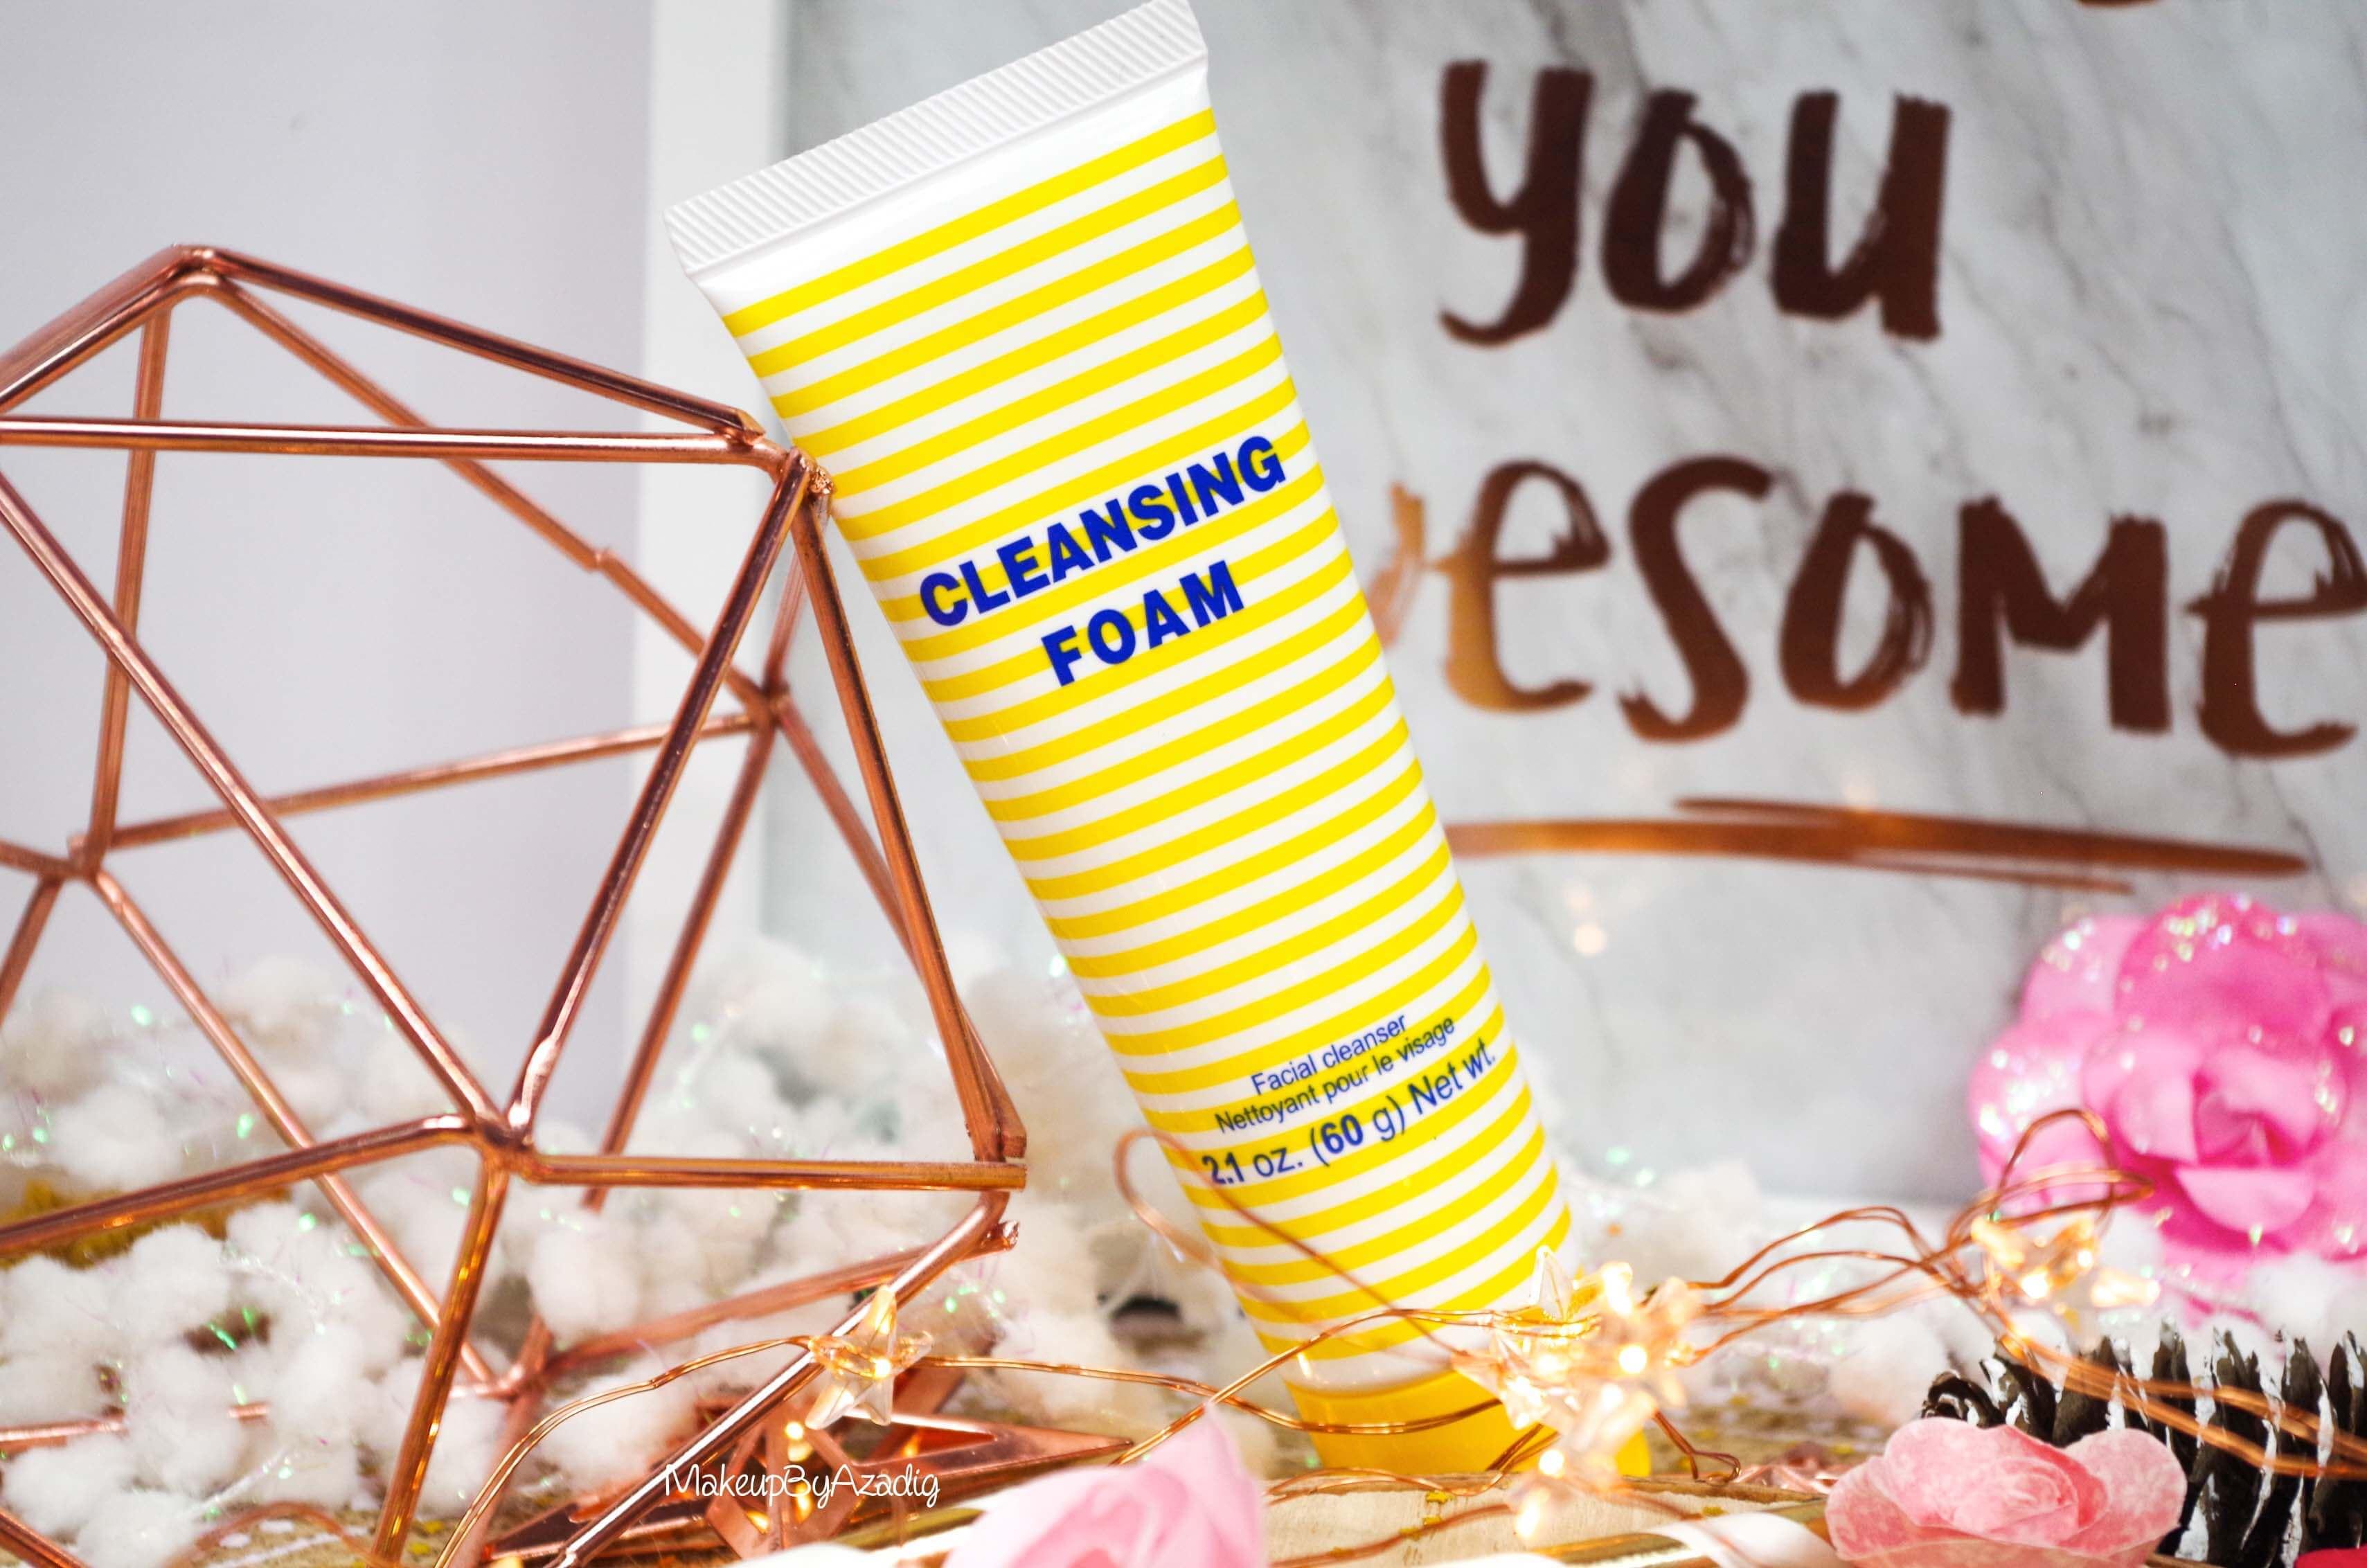 revue-review-cleansing-foam-creme-nettoyante-dhc-monoprix-parapharmacie-prix-avis-makeupbyazadig-awesome